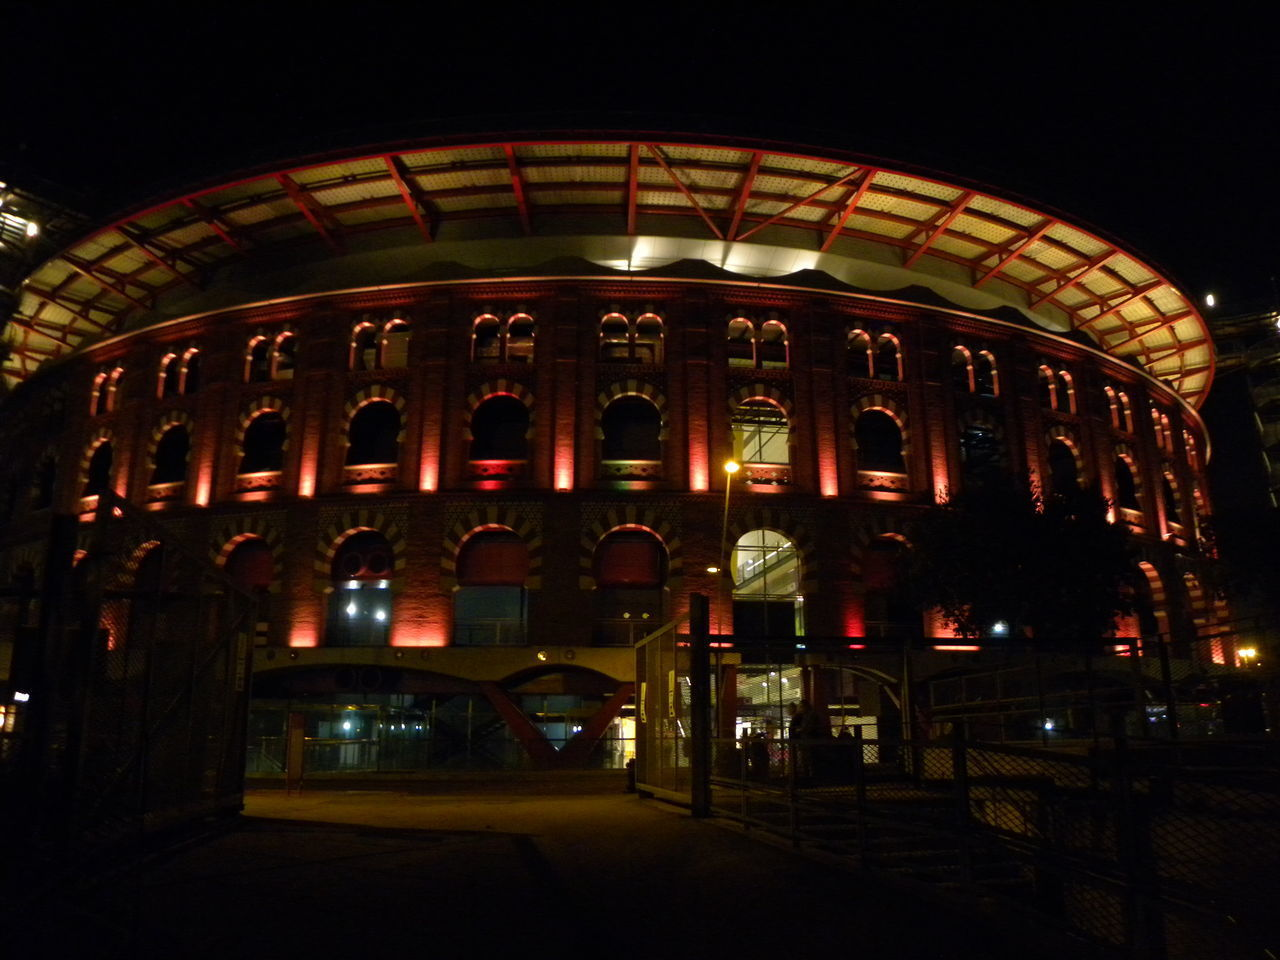 Architecture Arts Culture And Entertainment Barcelona Streets City Illuminated Night Plaza De Toros Plaza España